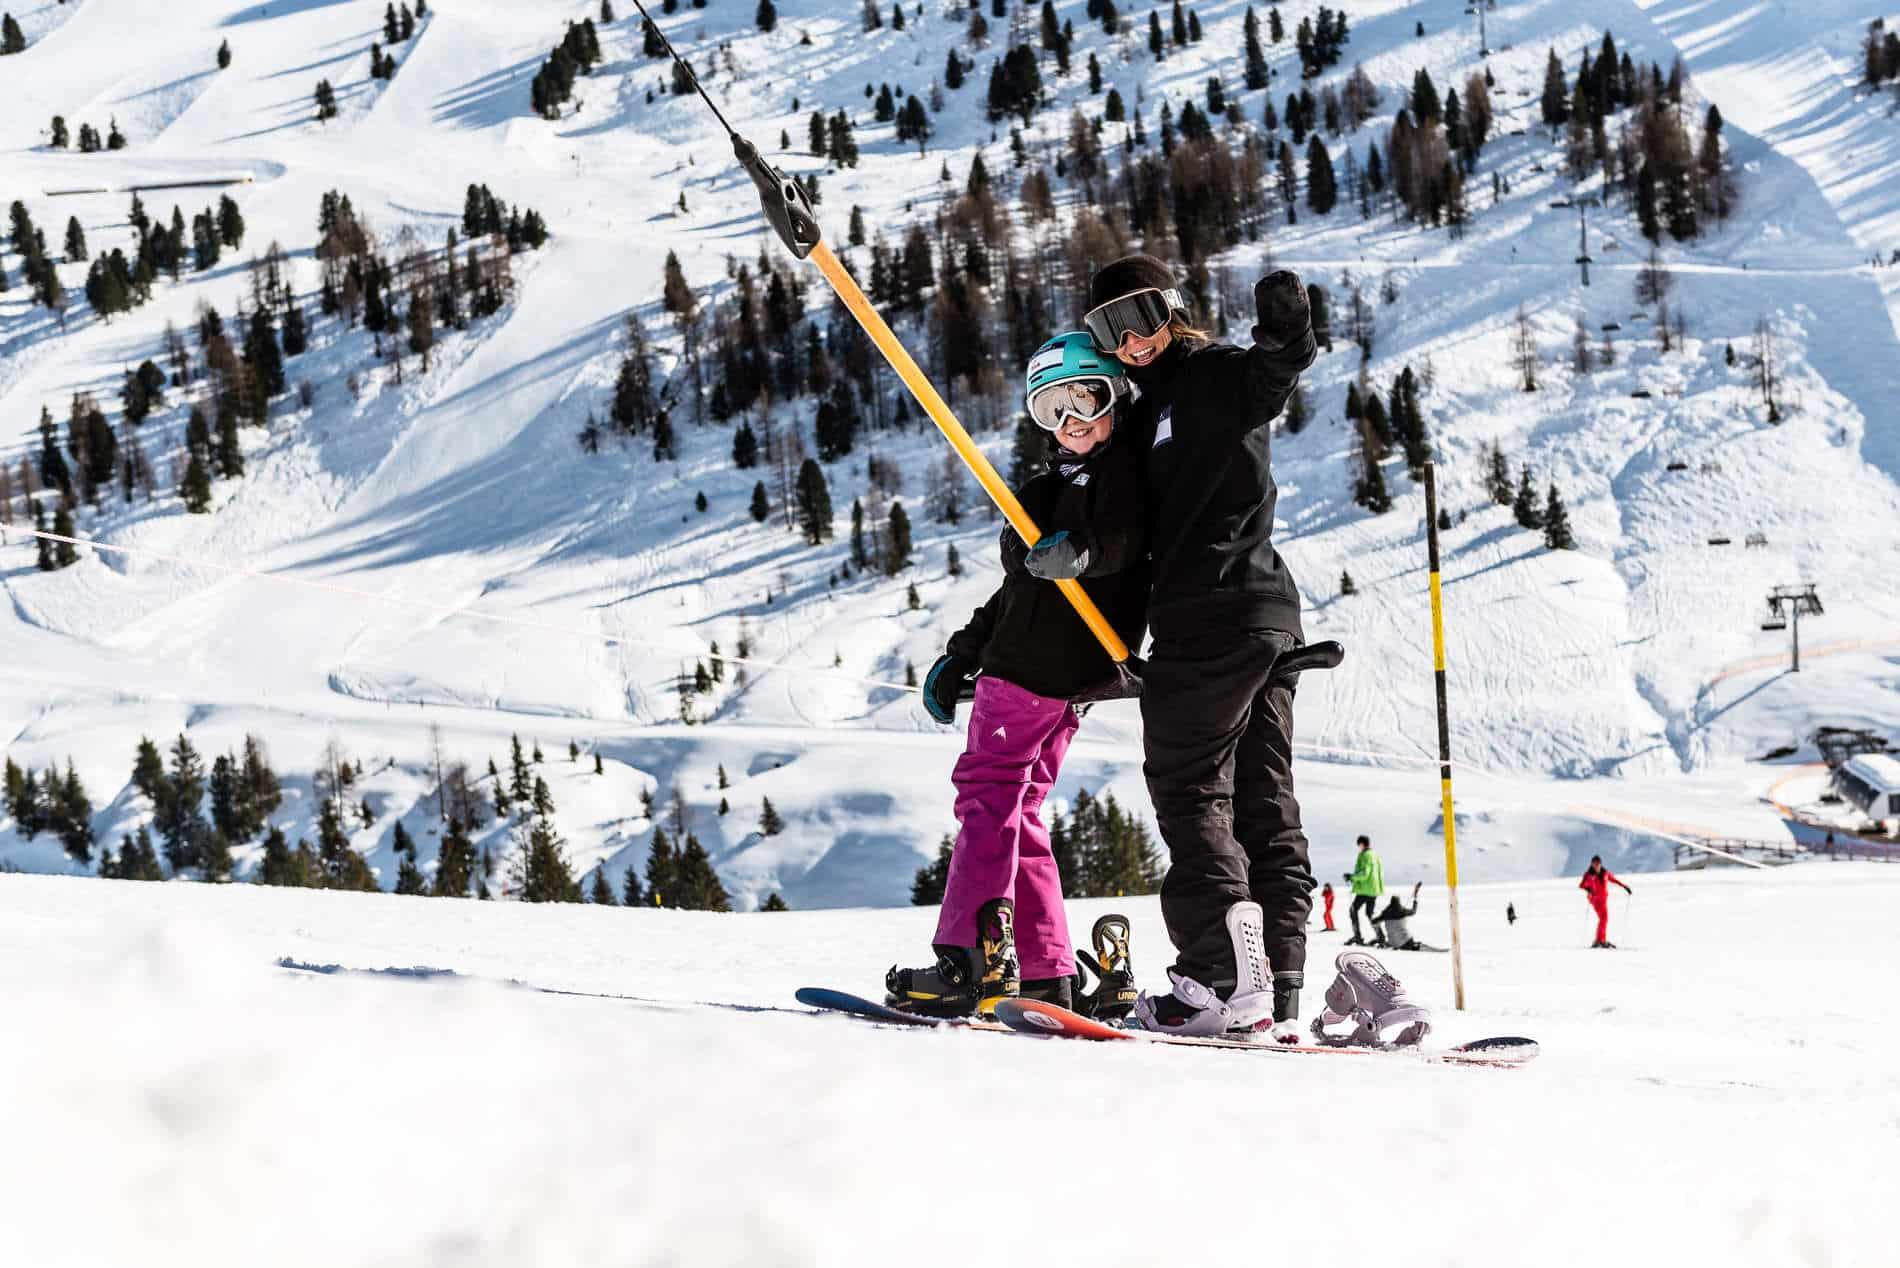 Roxy Girls Shred Session Mayrhofen